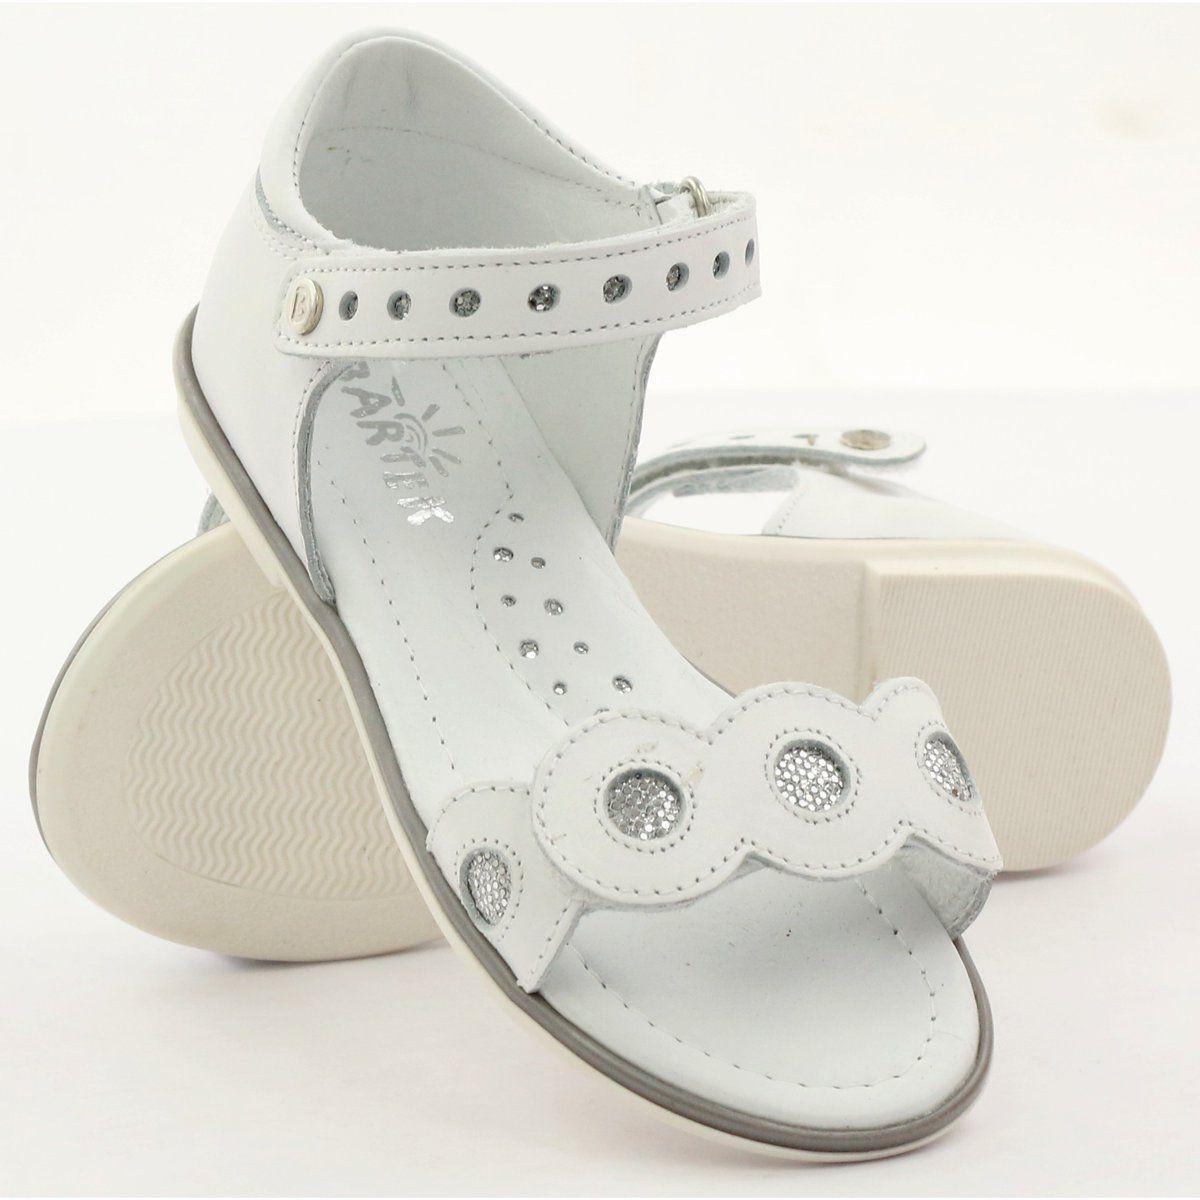 Sandalki Dziewczece Bartek Srebrne Kolka Biale Szare Shoes Sandals Fashion